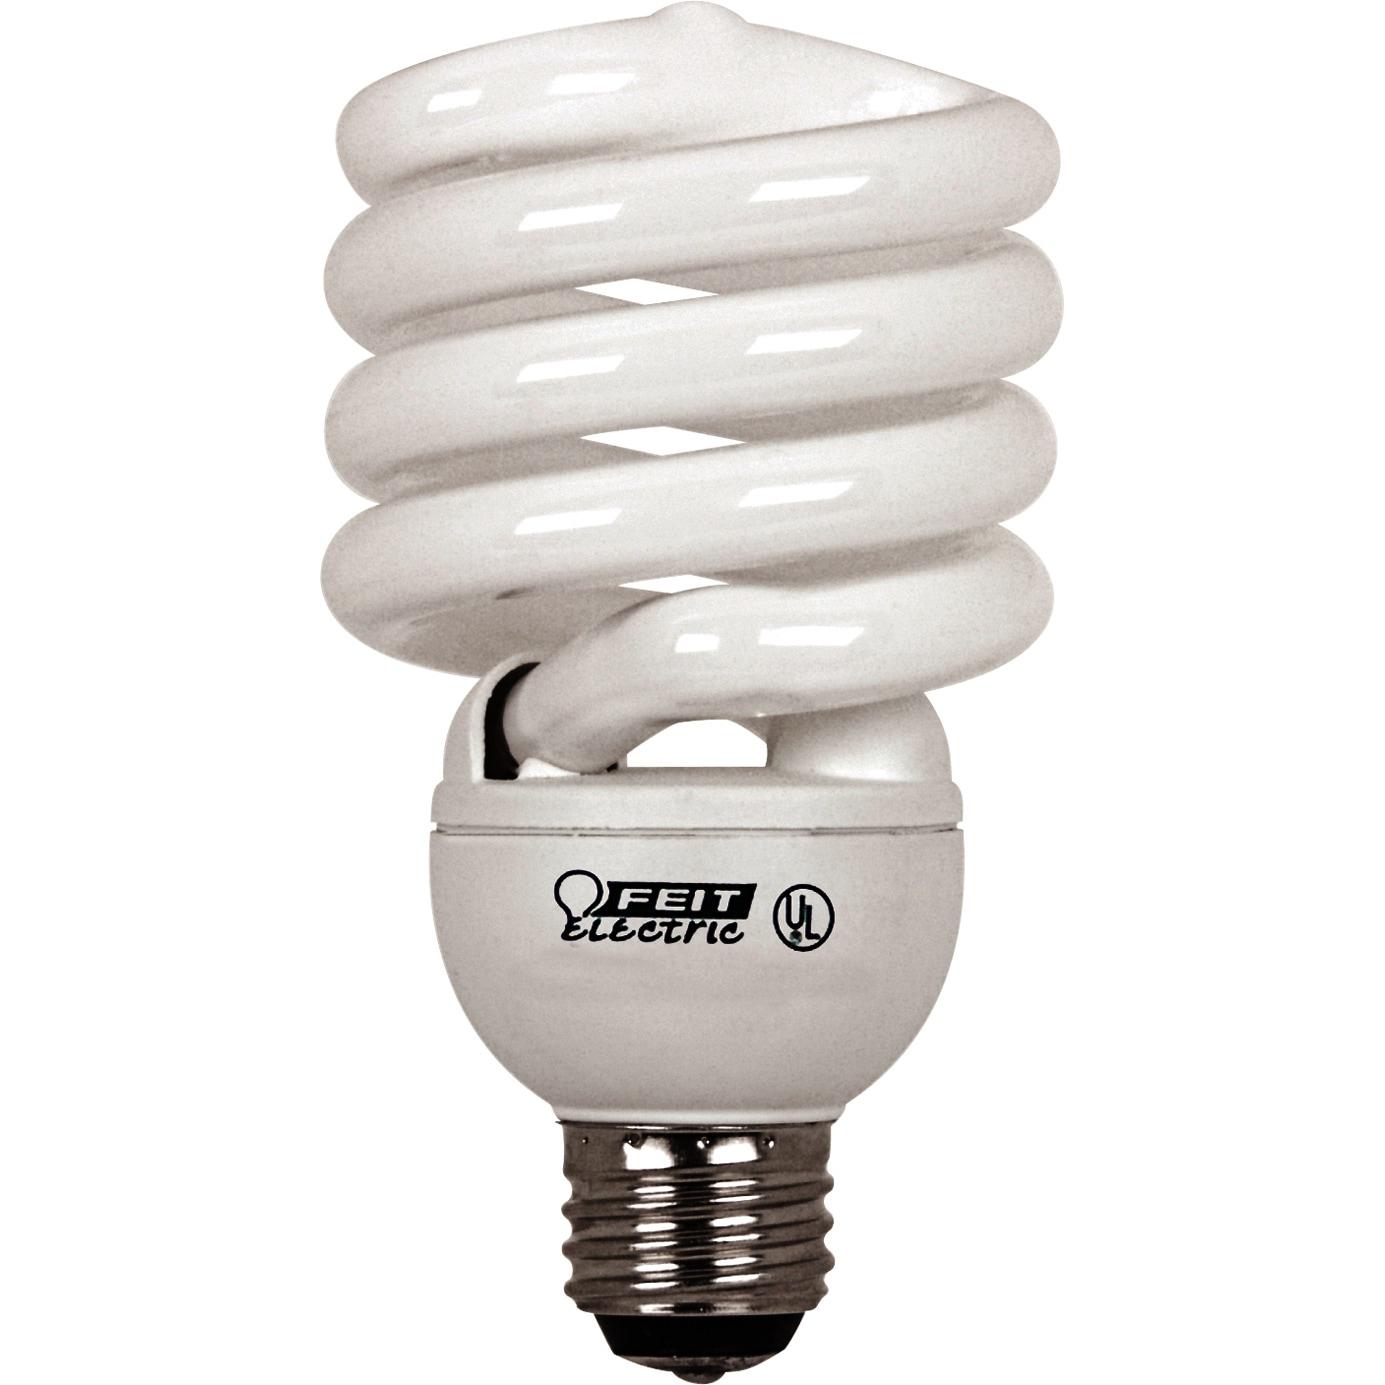 FEIT Electric ESL50/150T/ECO 12, 21 & 32 Watt Soft White ...